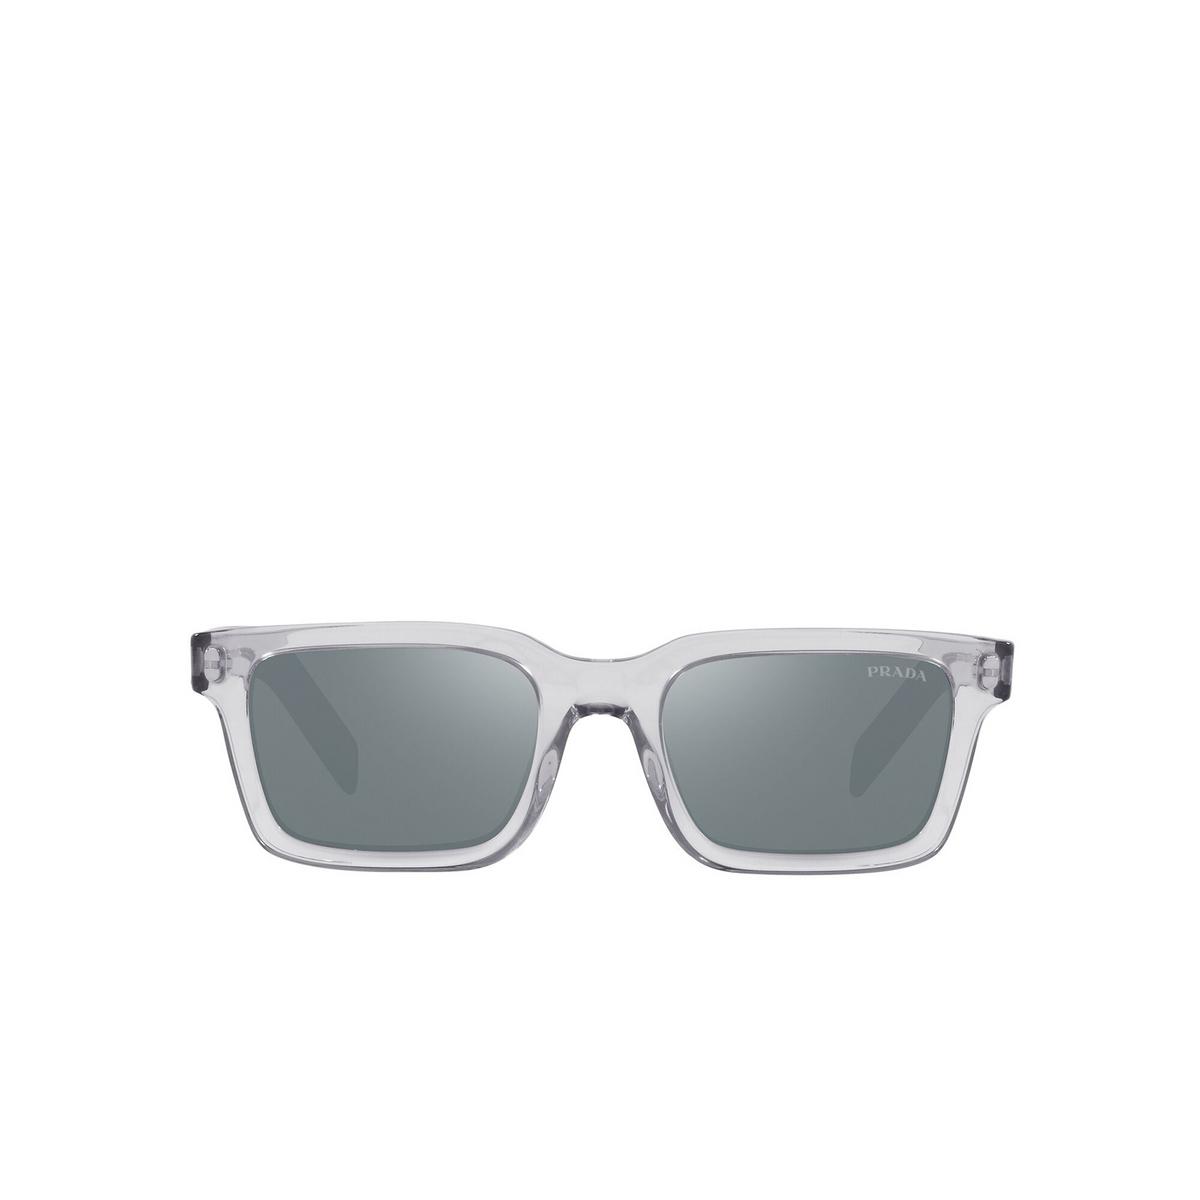 Prada® Rectangle Sunglasses: PR 06WS color Grey Crystal U4301A - front view.